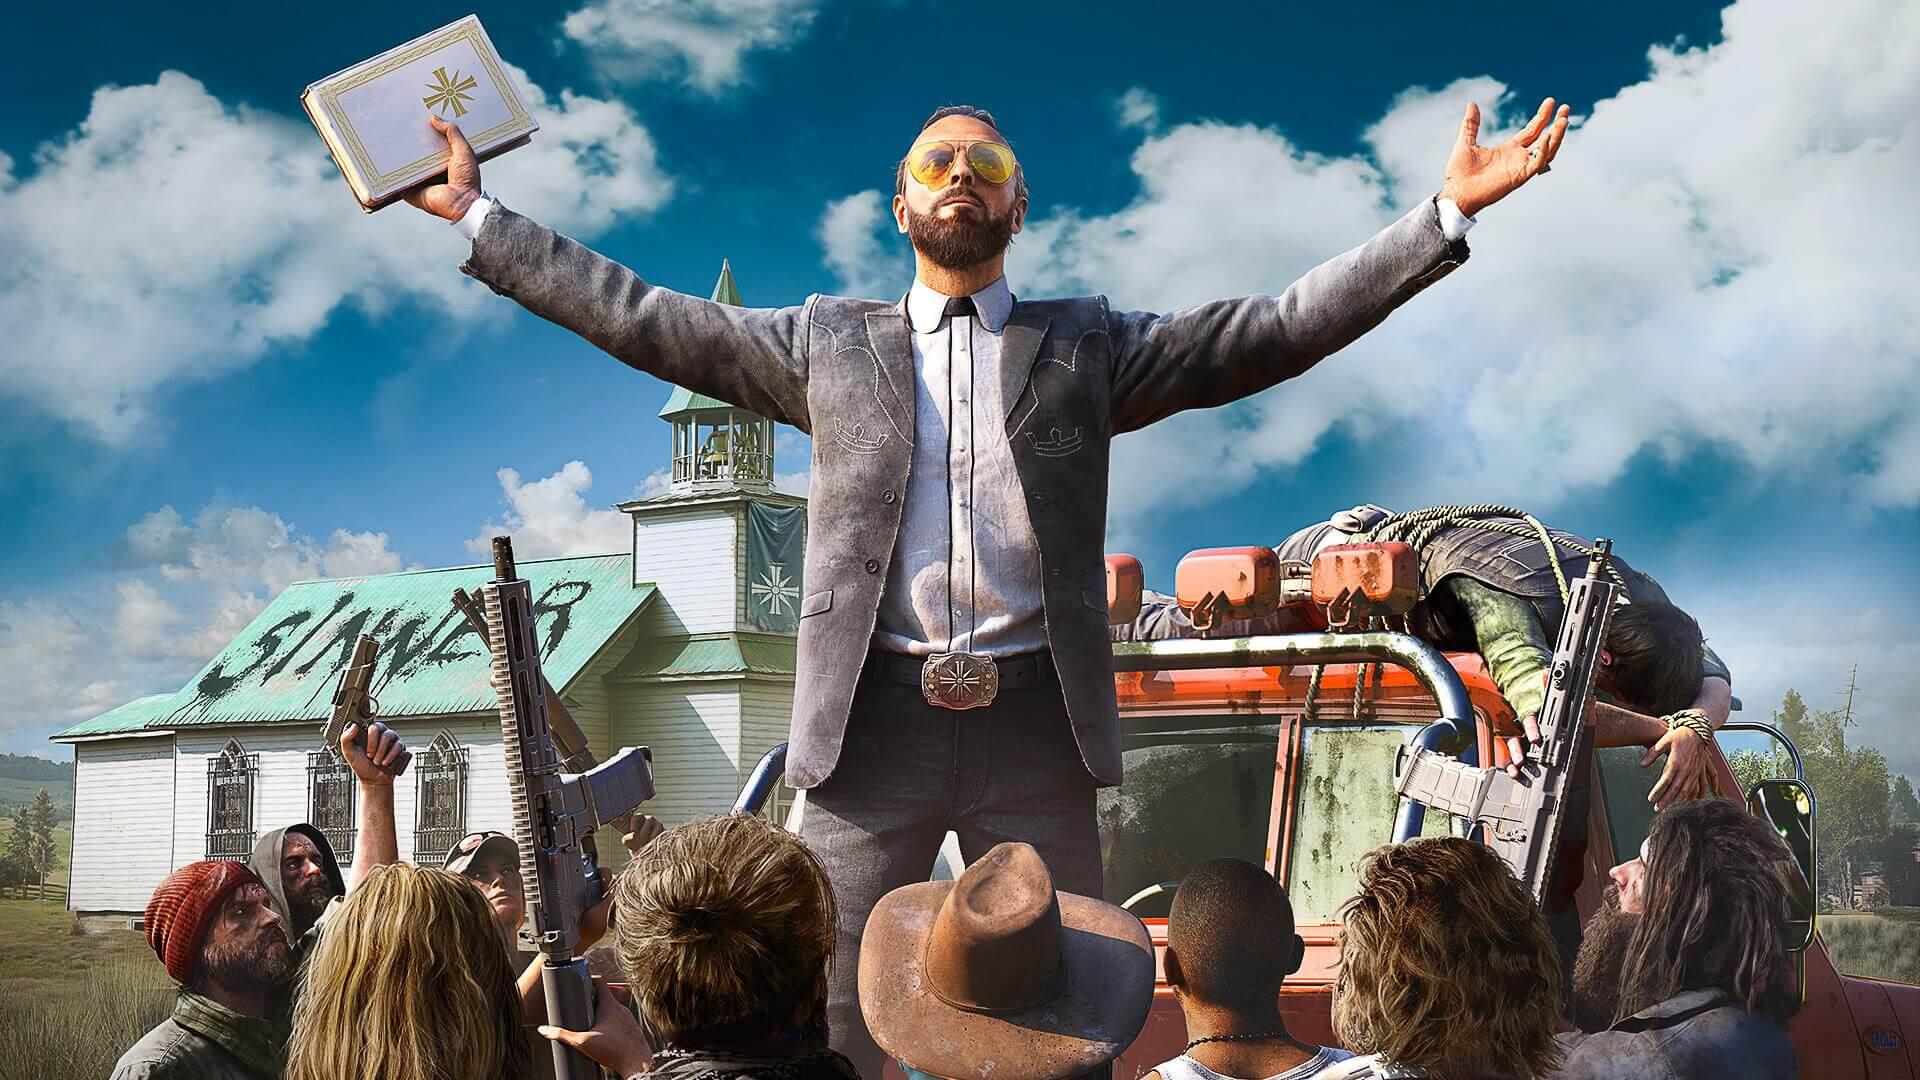 Soporte de Far Cry 5 | Ubisoft Help oficial